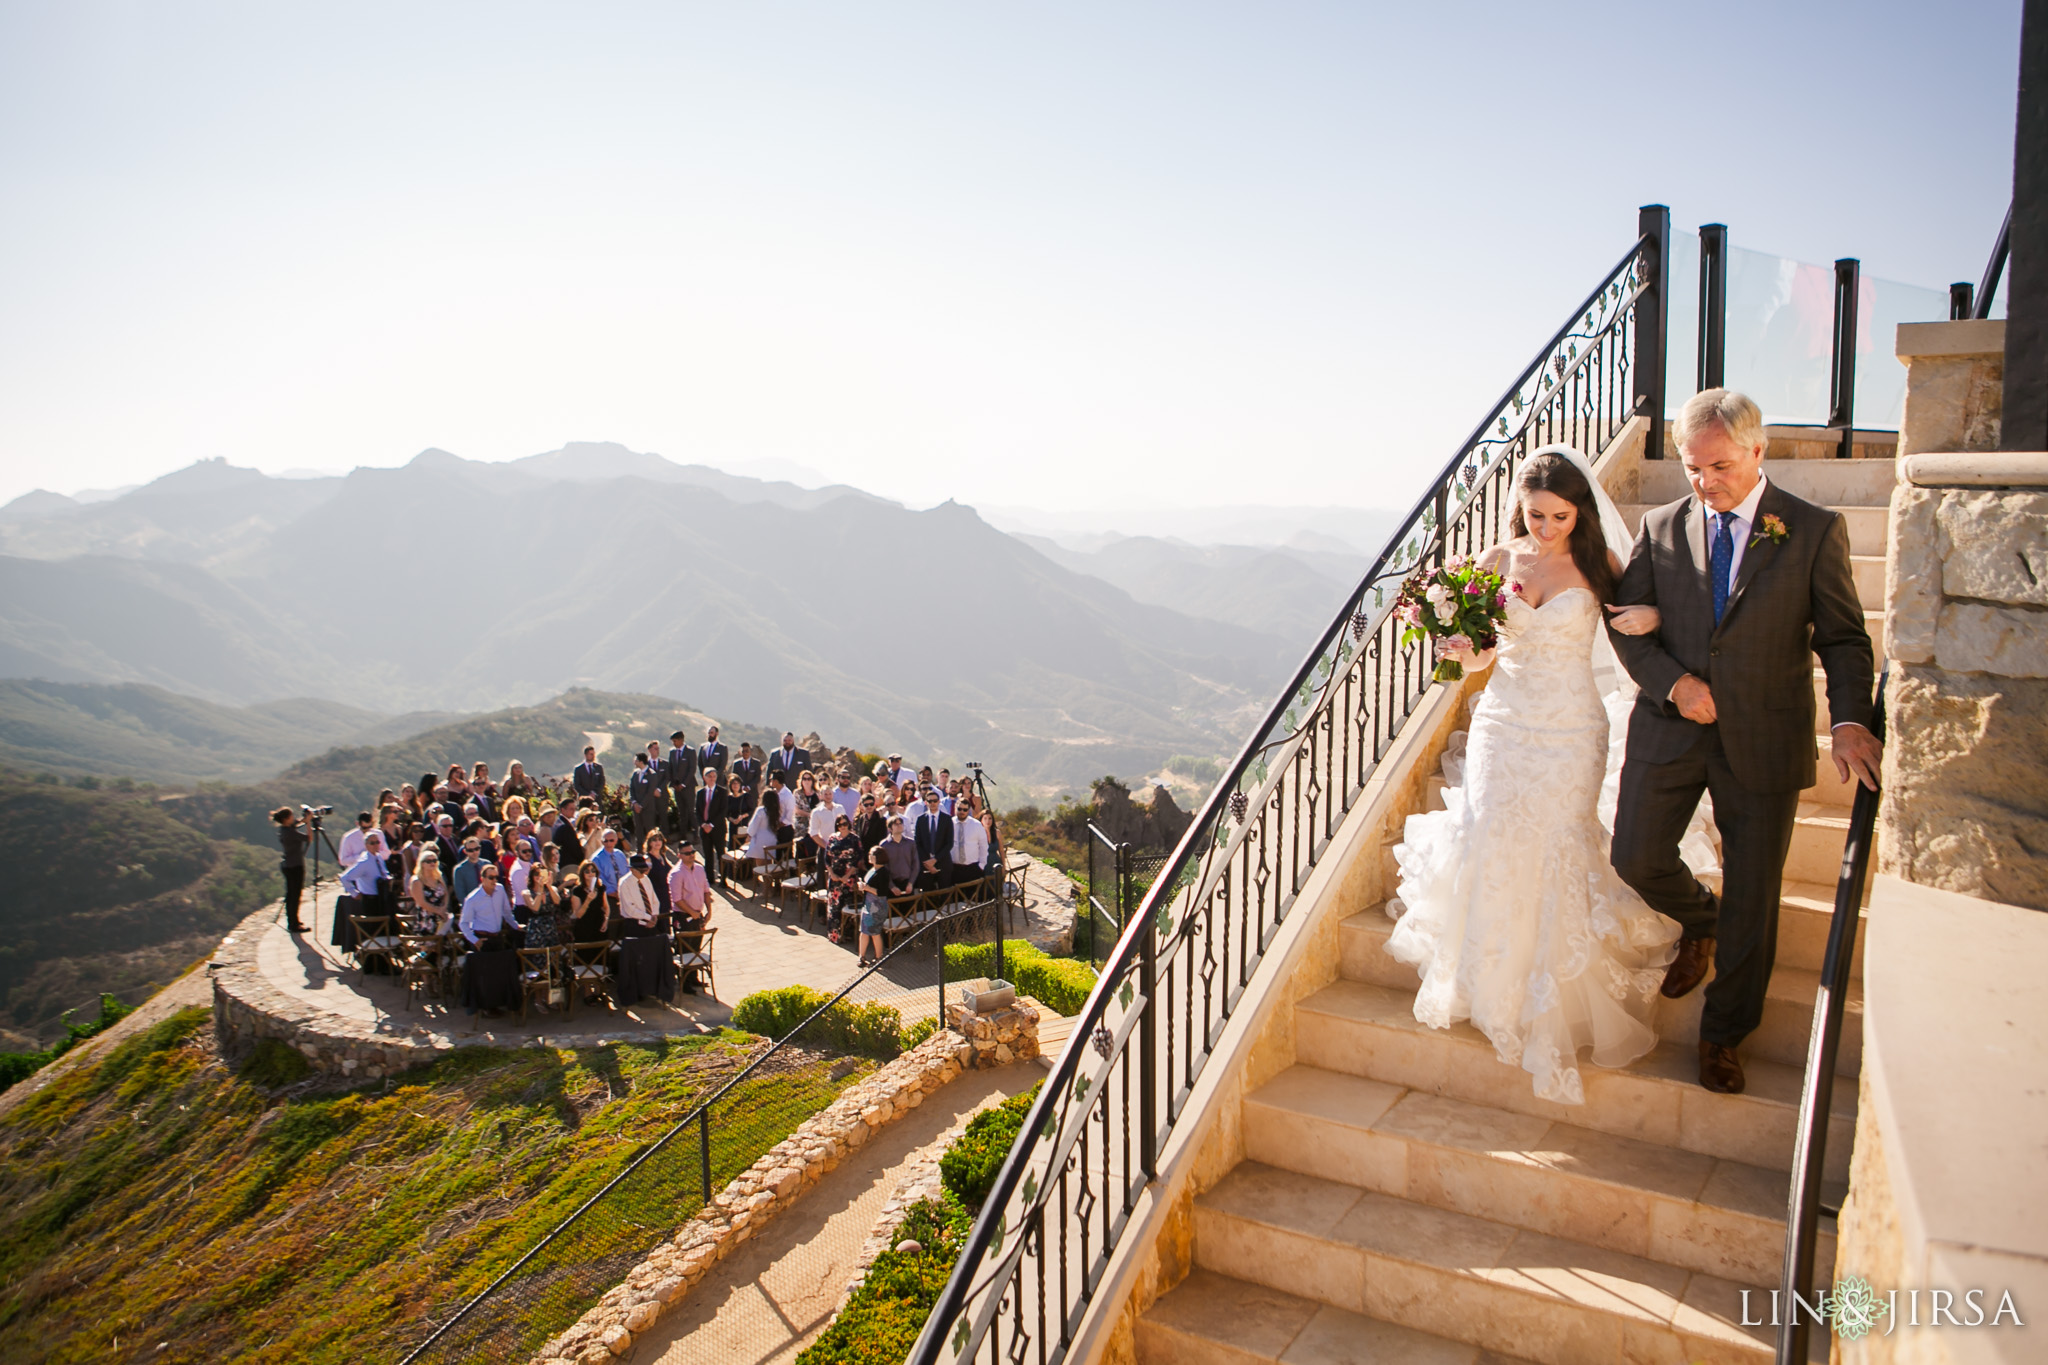 Malibu Rocky Oaks Wedding.Malibu Rocky Oaks Estate Wedding Breanna Jonathan